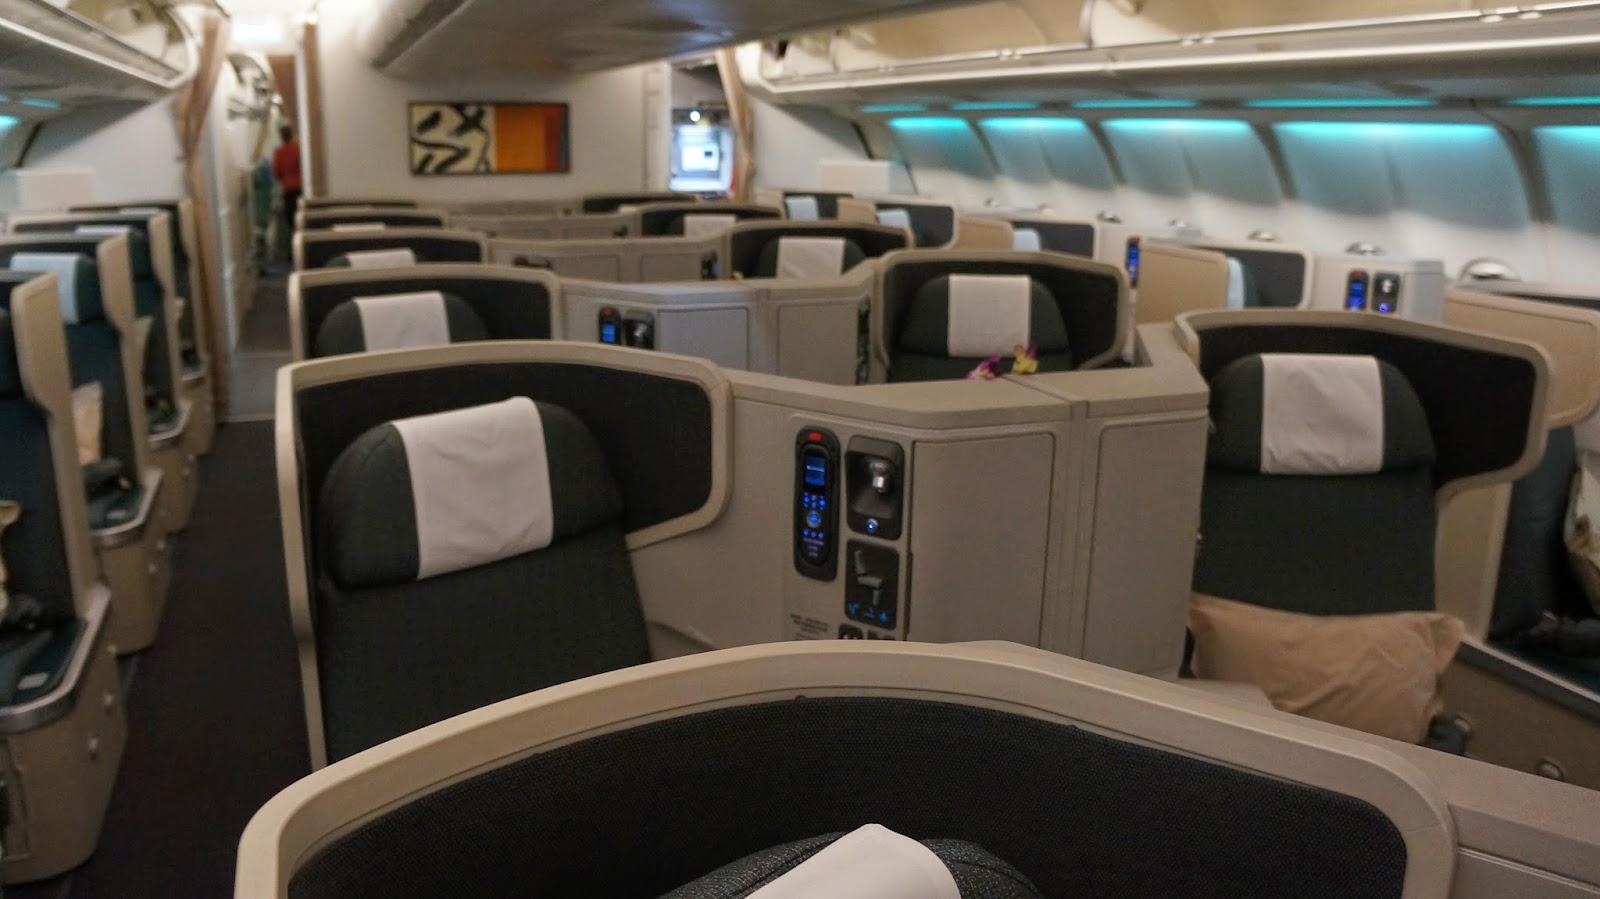 hotelholic: 國泰香港-臺北商務艙(Cathay Pacific Business Class: Hong Kong-Taipei)